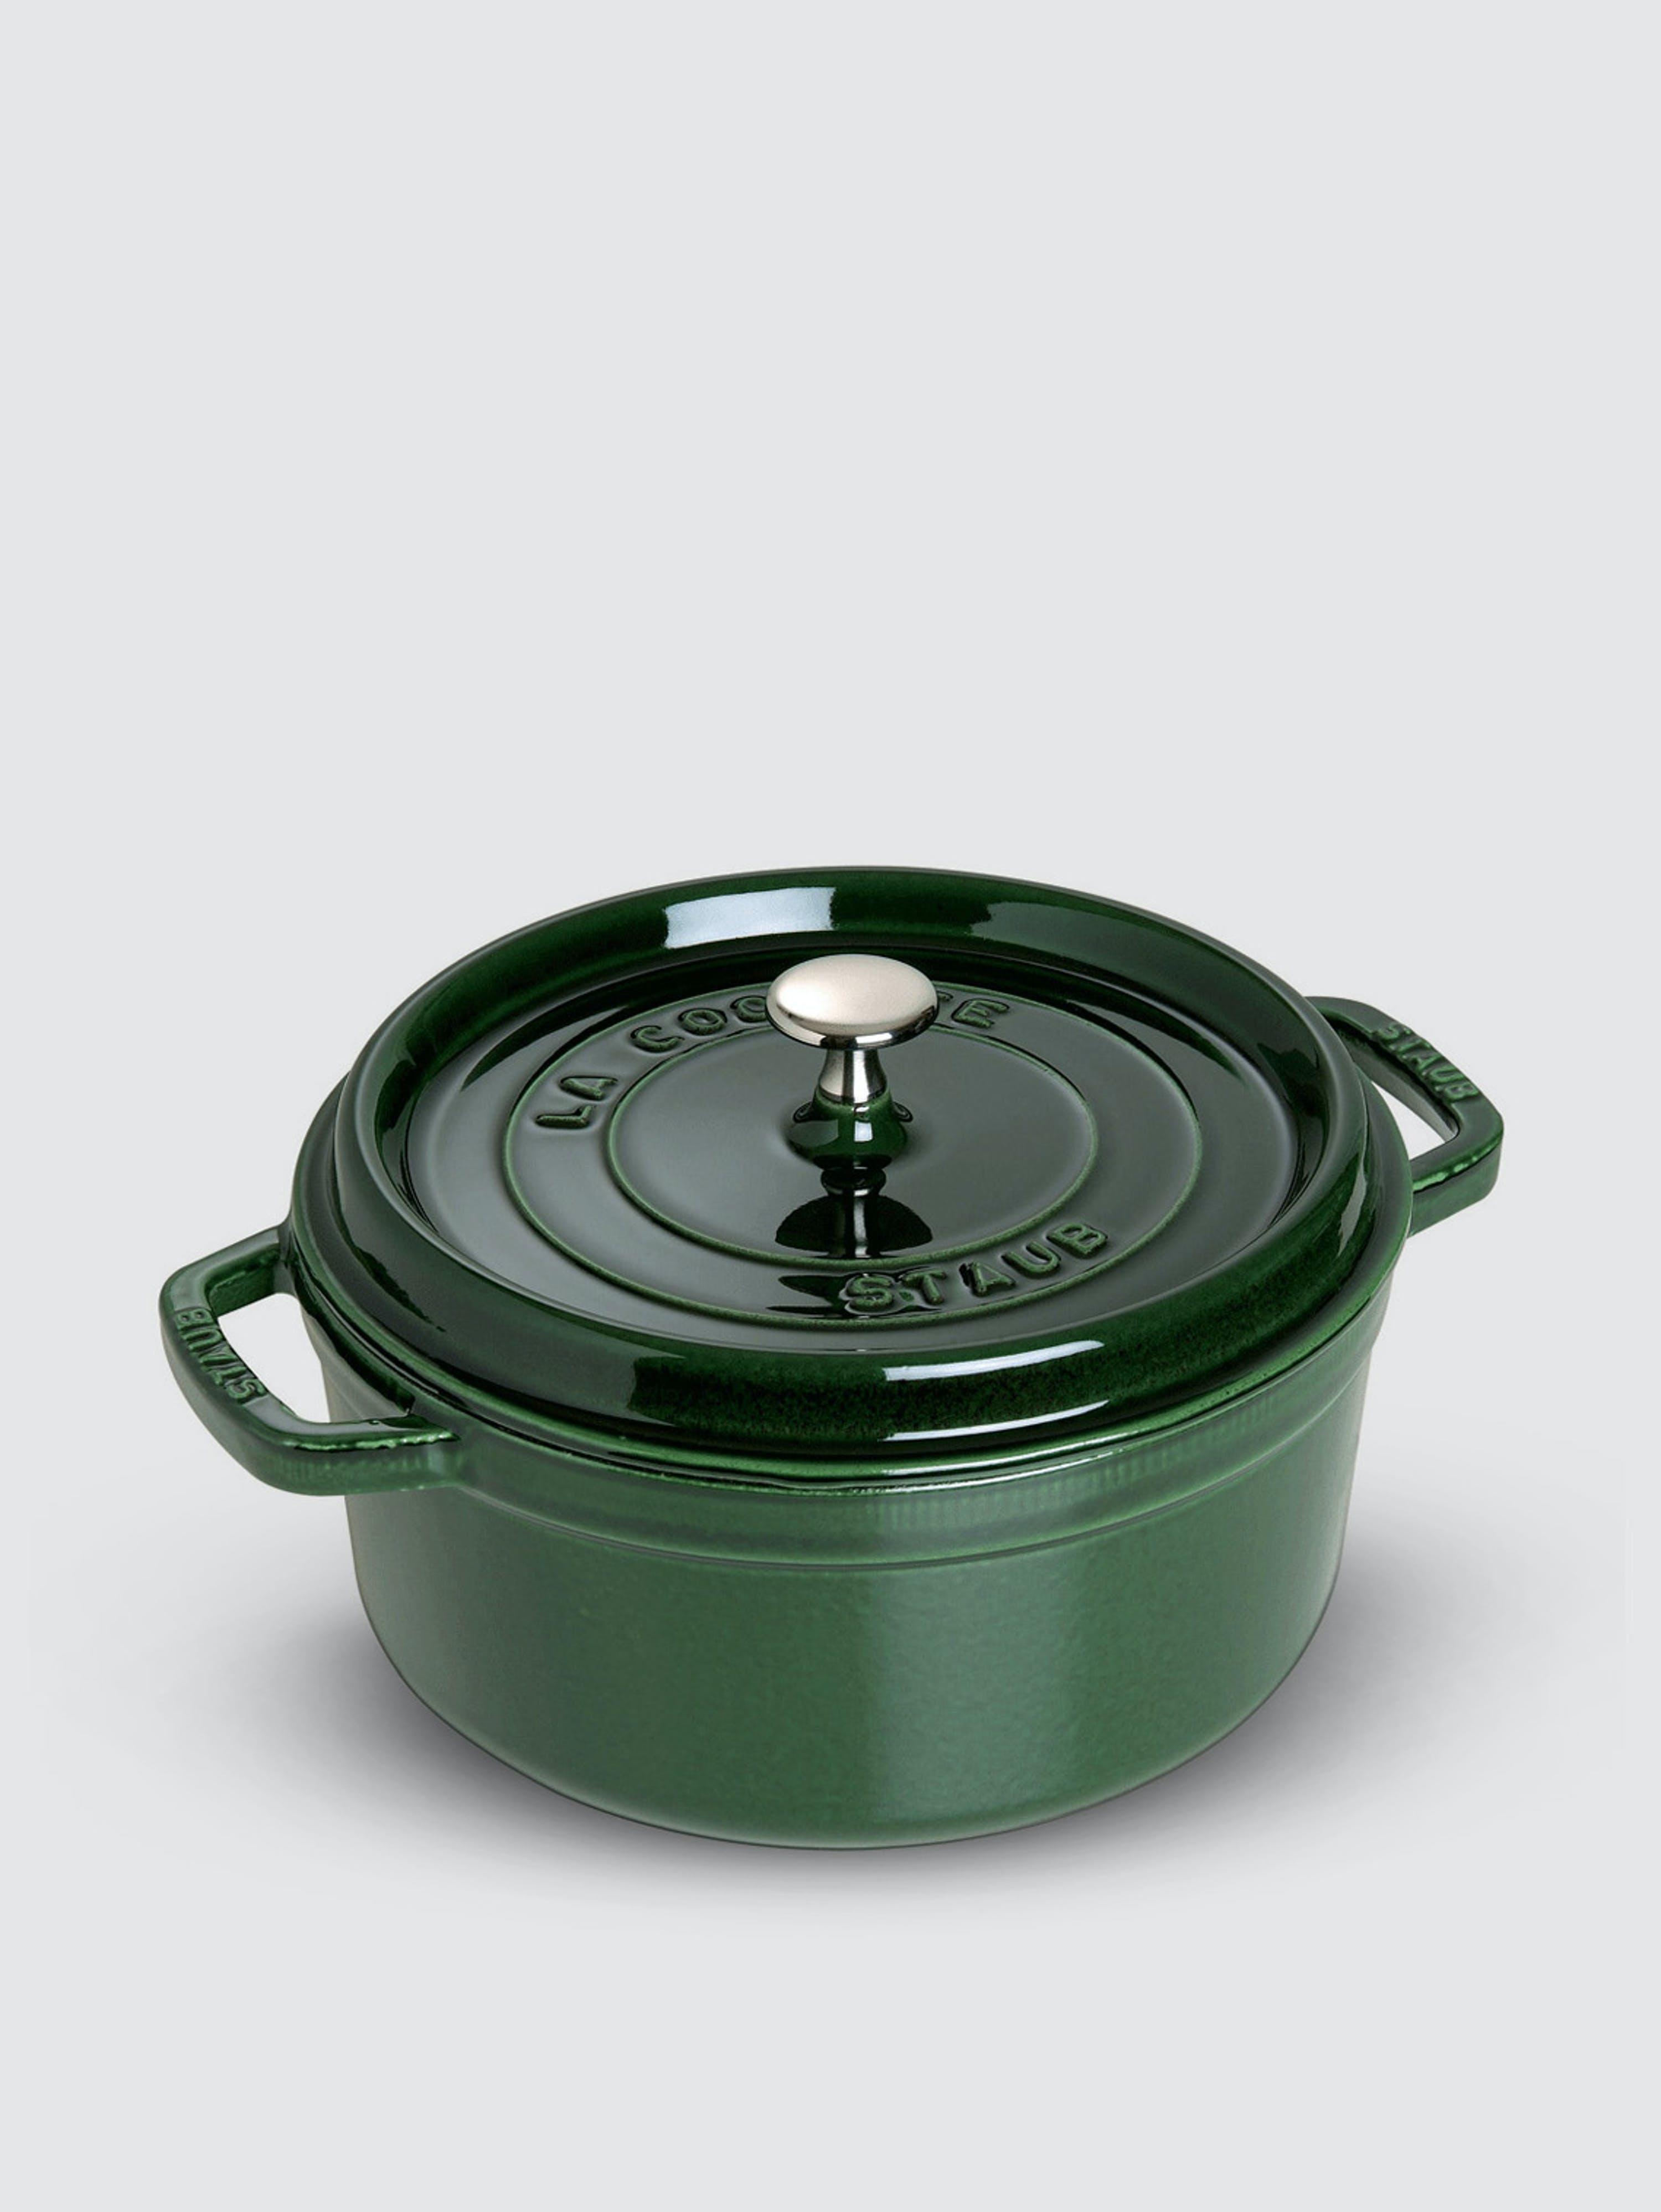 Staub - Verified Partner 2.75-Qt Round Cocotte  - Green